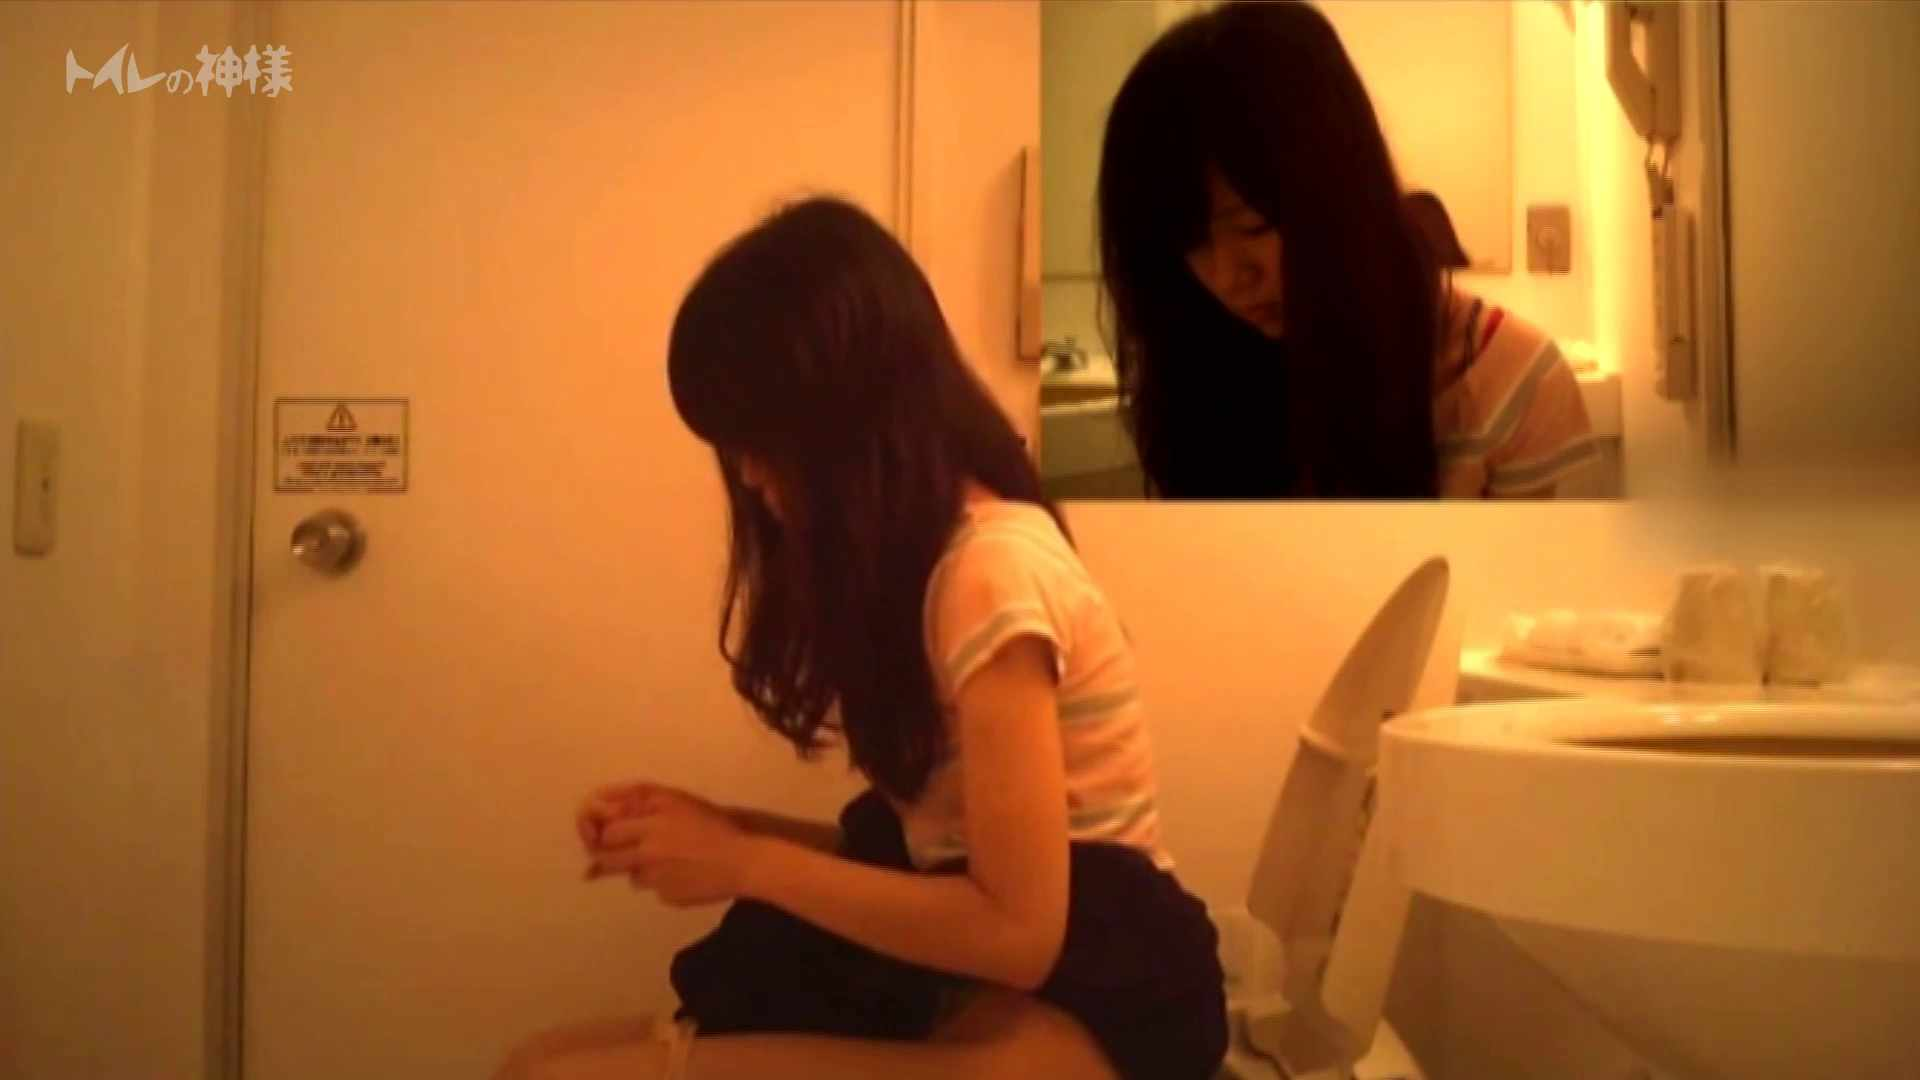 Vol.04 女子大生のトイレ恥態 OLハメ撮り  104Pix 49